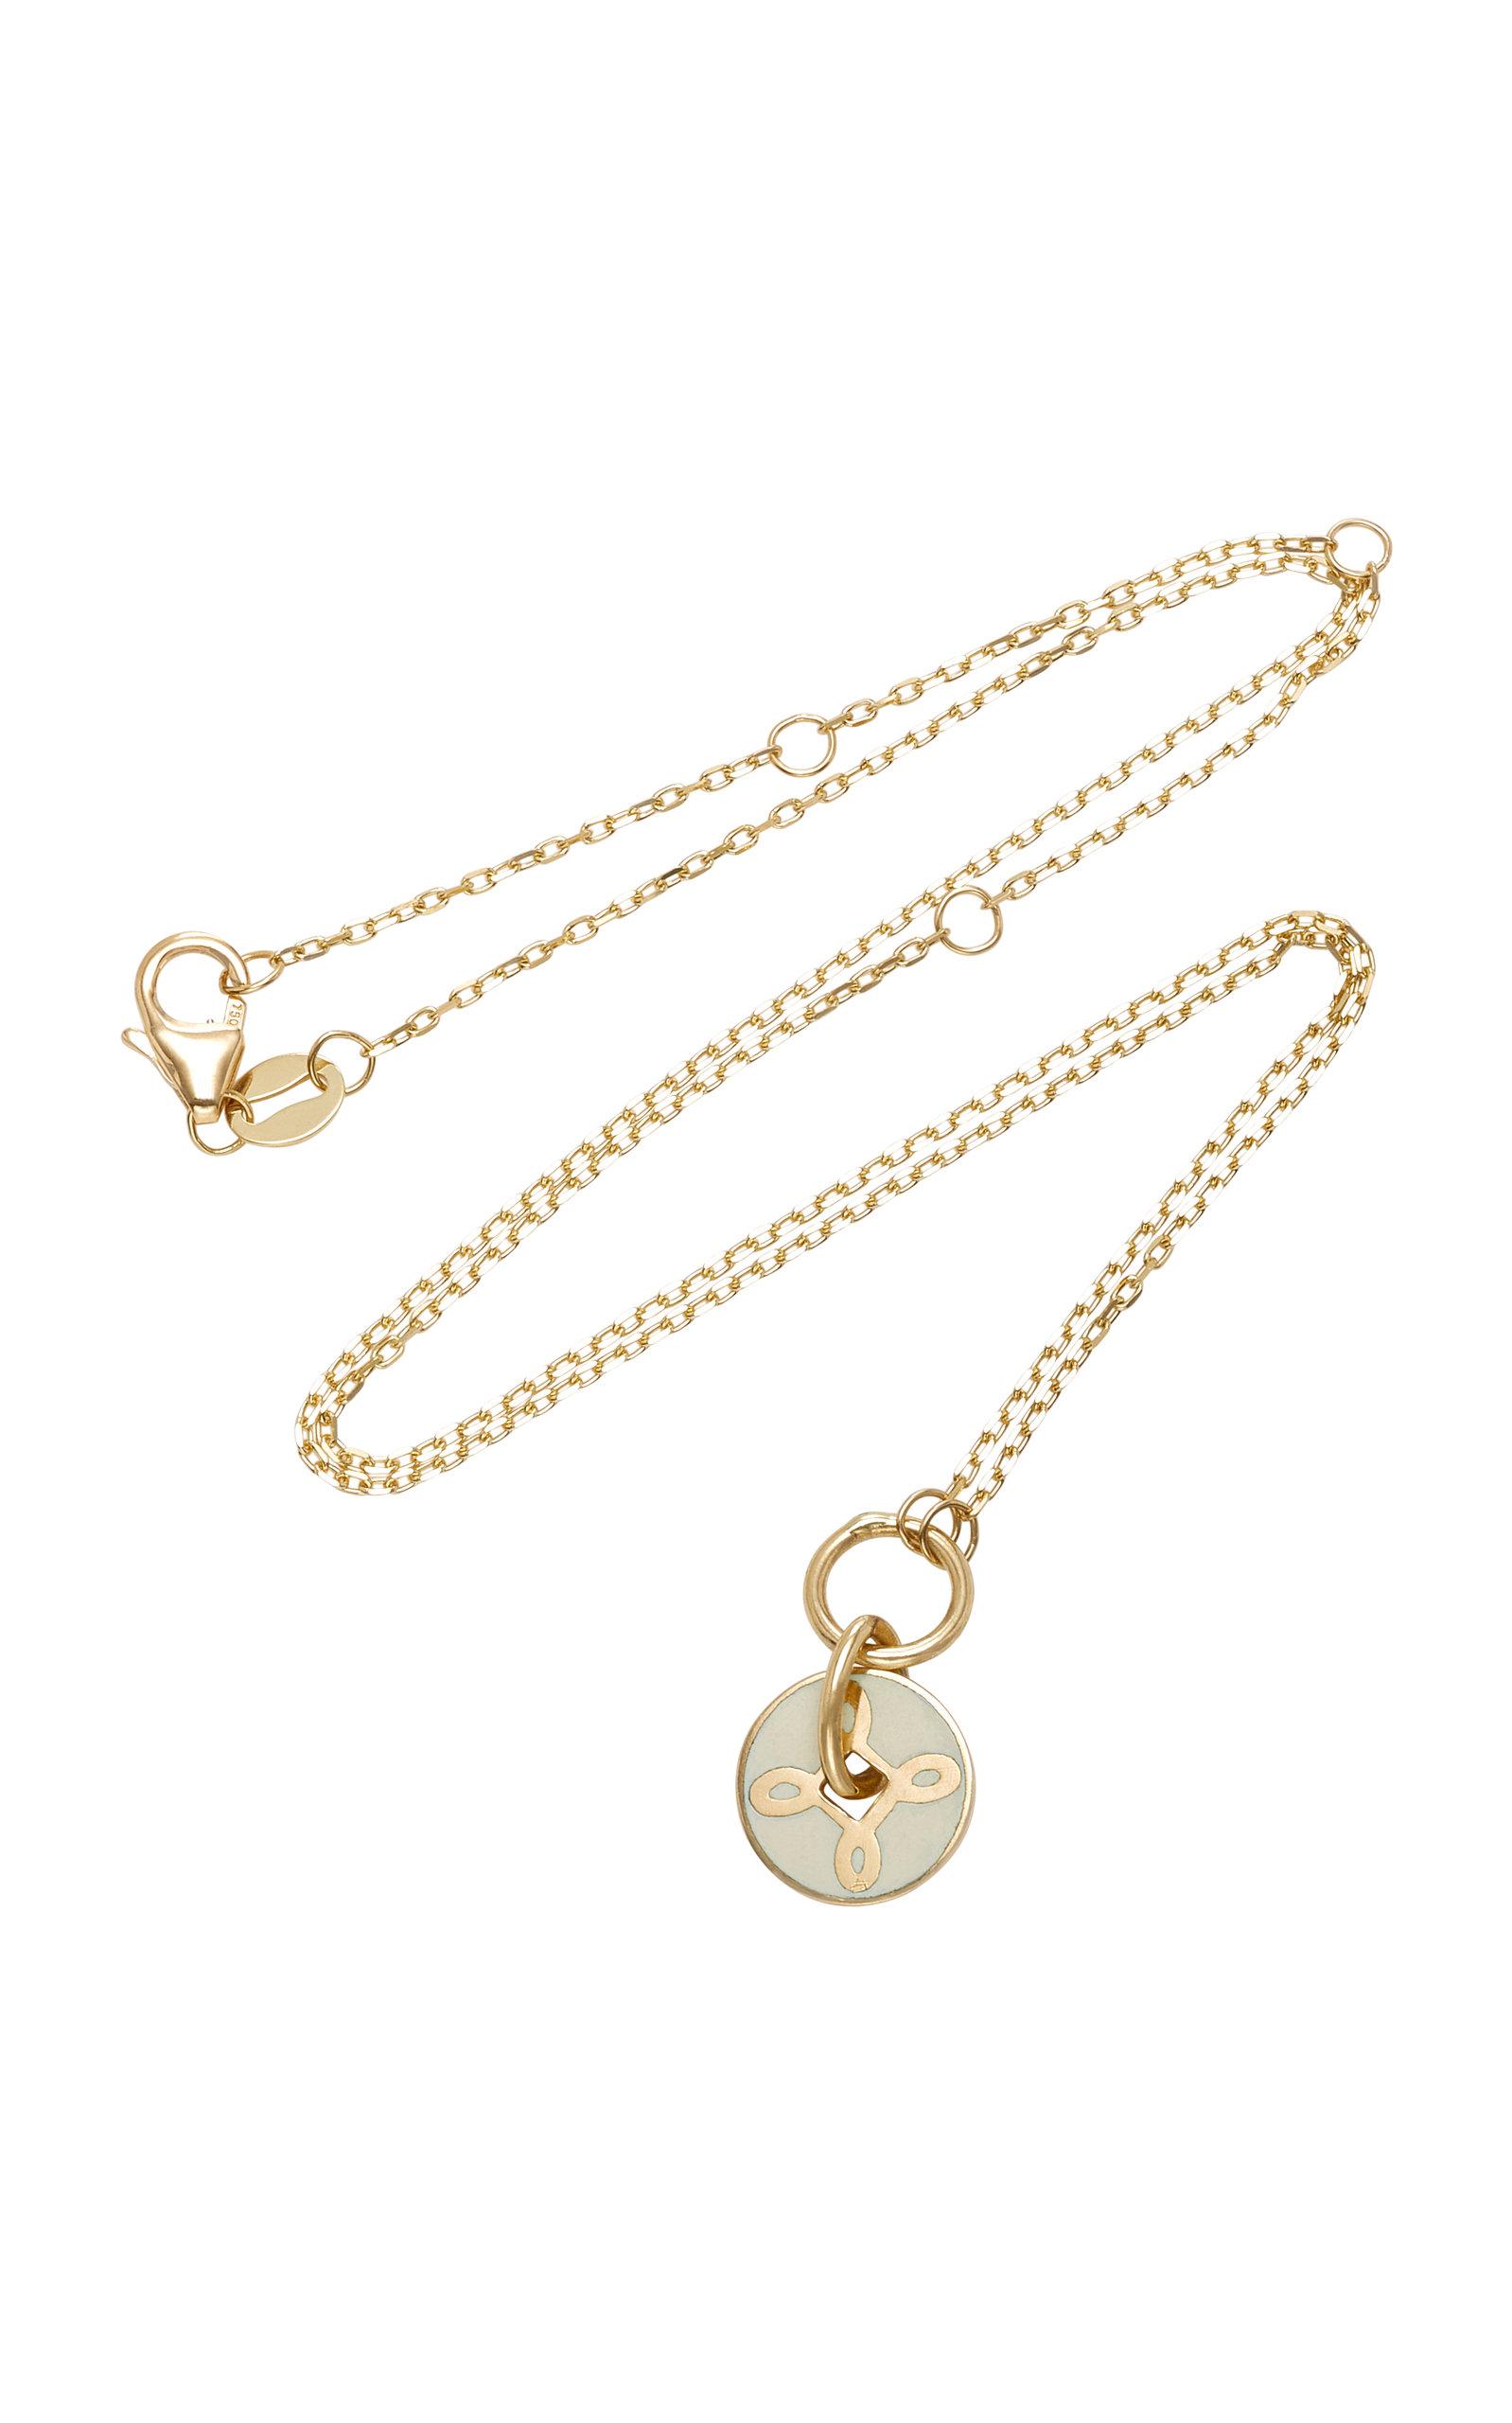 Foundrae True Love 18K Gold Necklace 5GiVGHlI